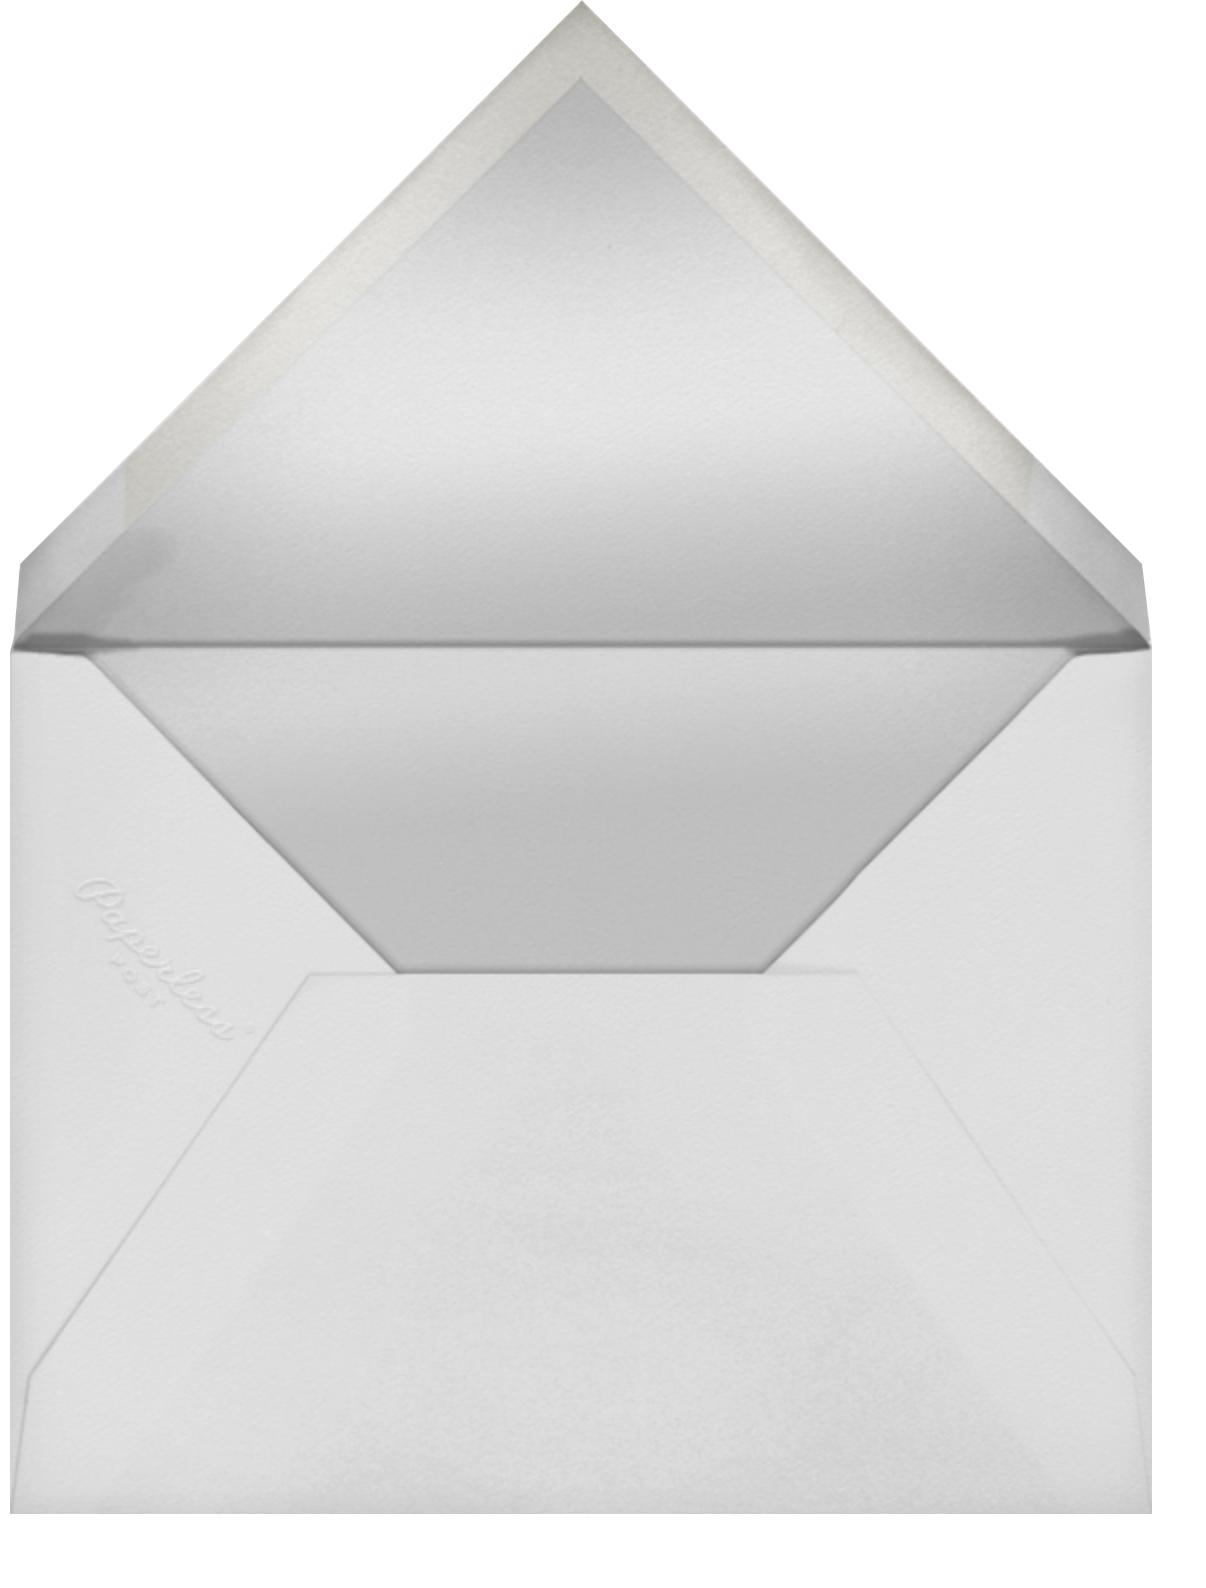 Flamingo Lagoon (Menu) - Yellow - Rifle Paper Co. - Menus - envelope back